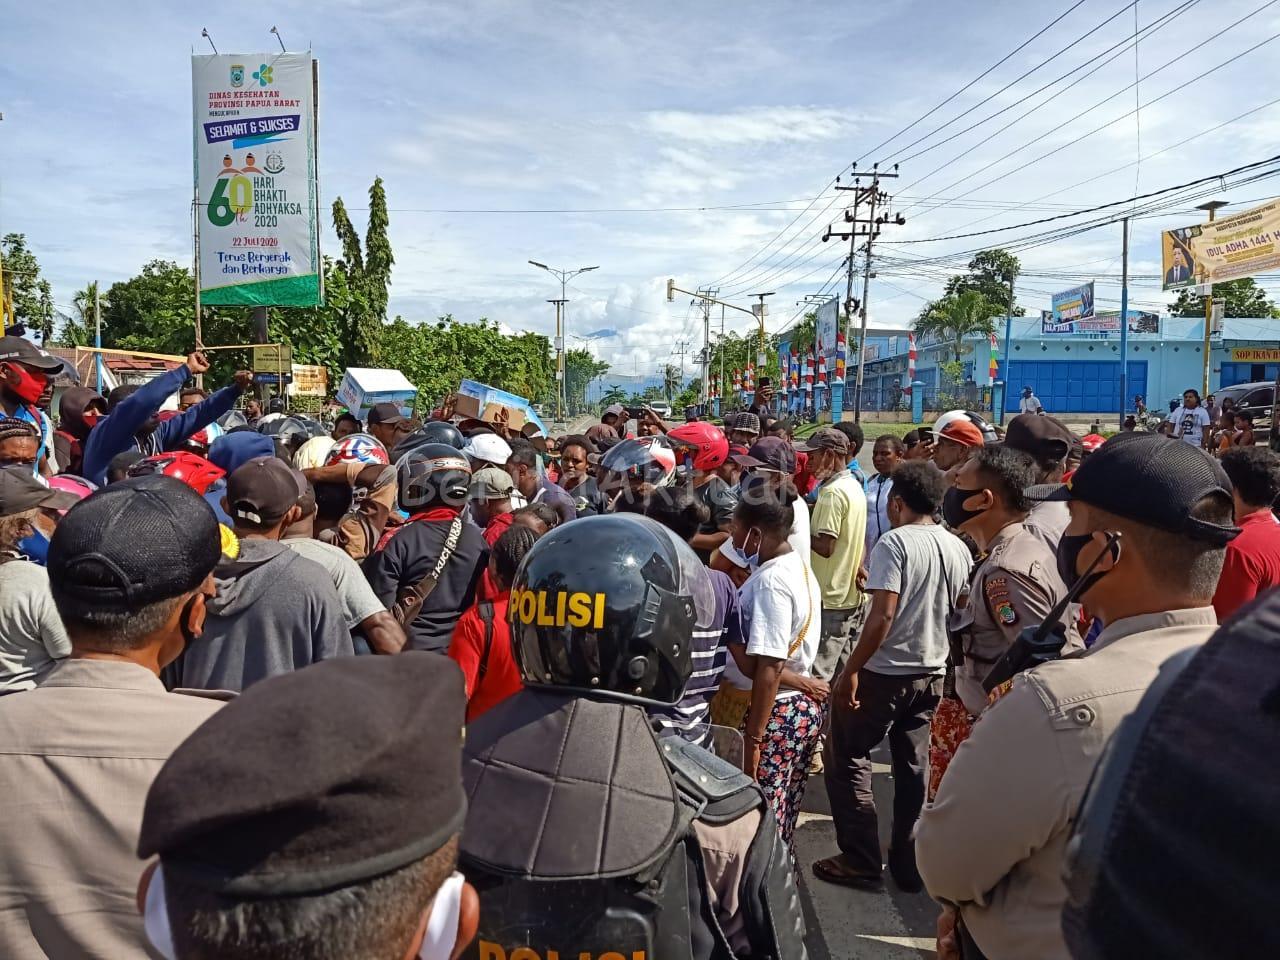 Kecewa Hasil Tes CPNS Manokwari, Pencaker Gelar Orasi Dan Bakar Ban di Sanggeng 16 IMG 20200731 WA0064